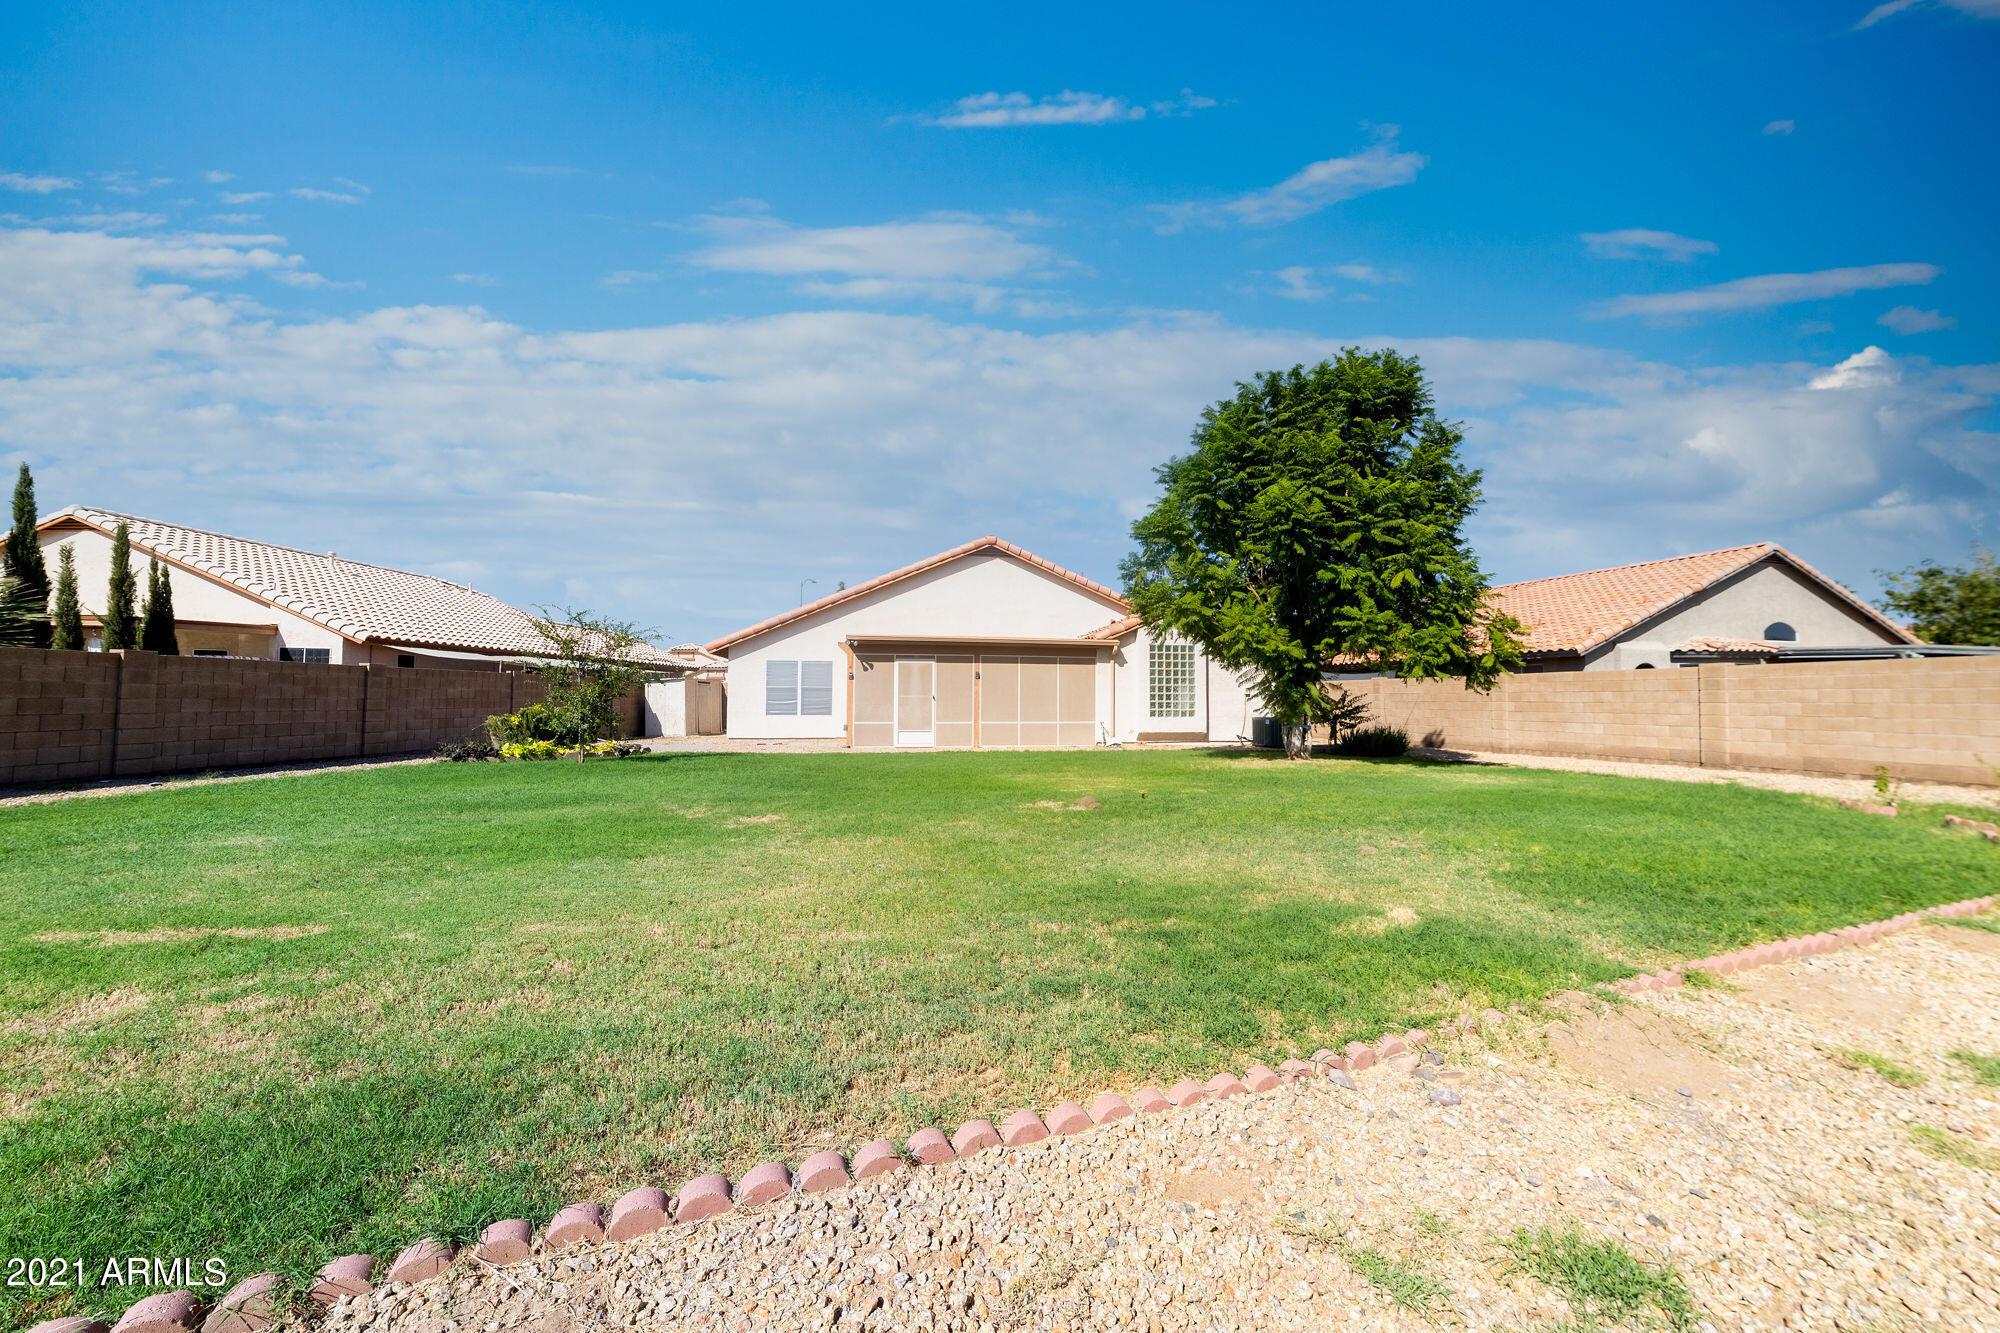 MLS 6298167 12557 W HOLLY Street, Avondale, AZ 85392 Avondale AZ Rancho Santa Fe